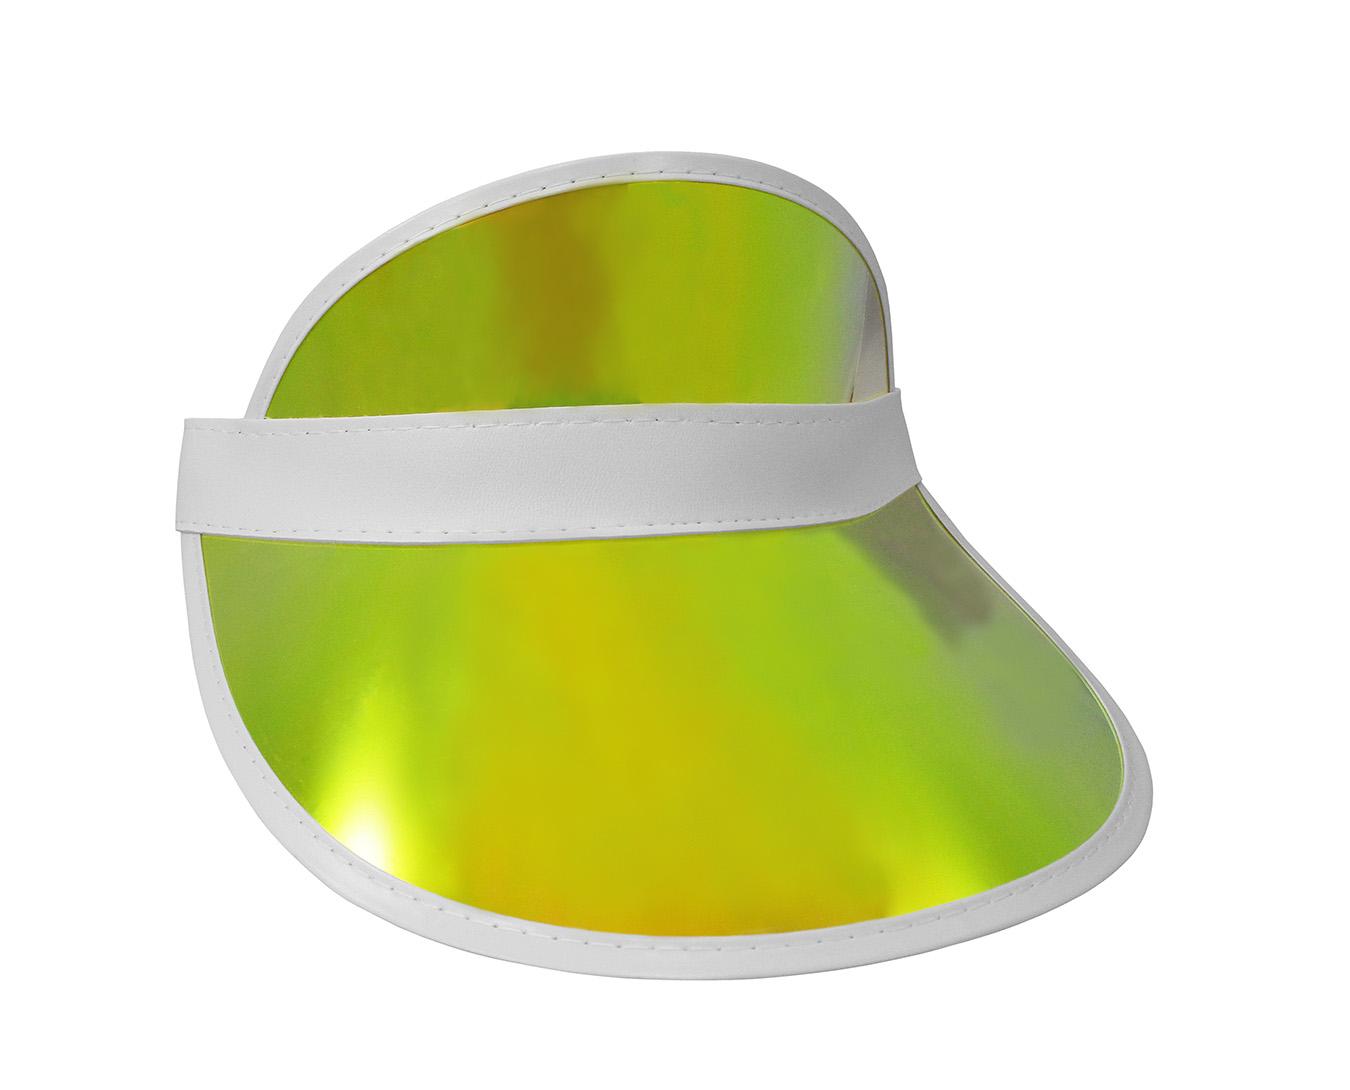 thumbnail 3 - Tennis-Beach-Iridescent-Mirrored-Plastic-Sun-Vegas-Golf-Casino-Visor-Hat-Qty-3